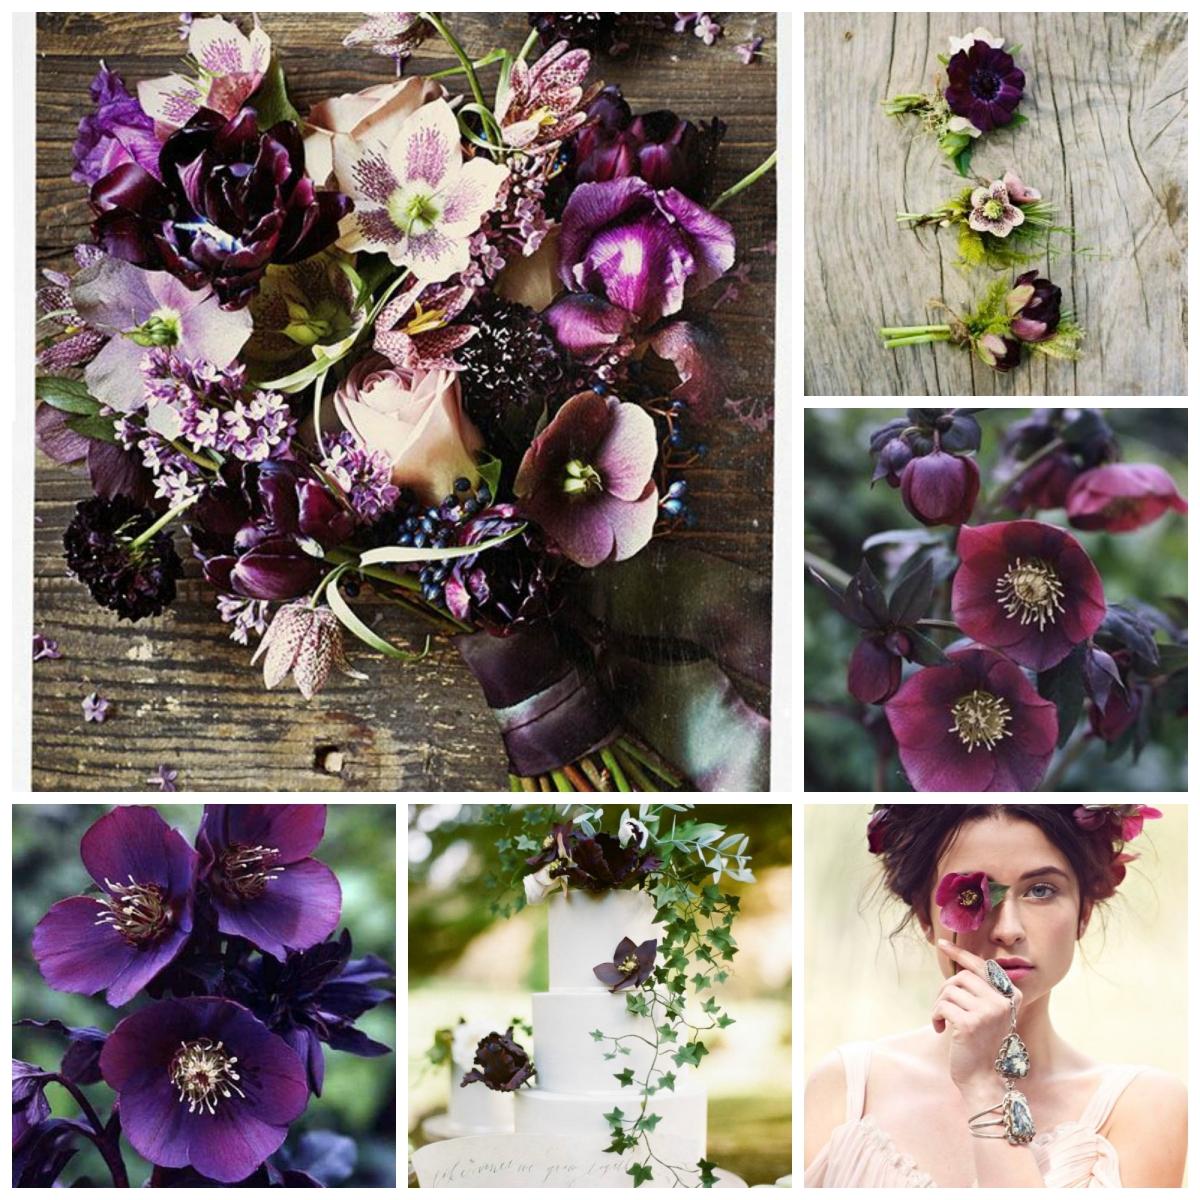 Wedding Flowers In Season In January : Seasonal wedding flowers jan march whisper and blush